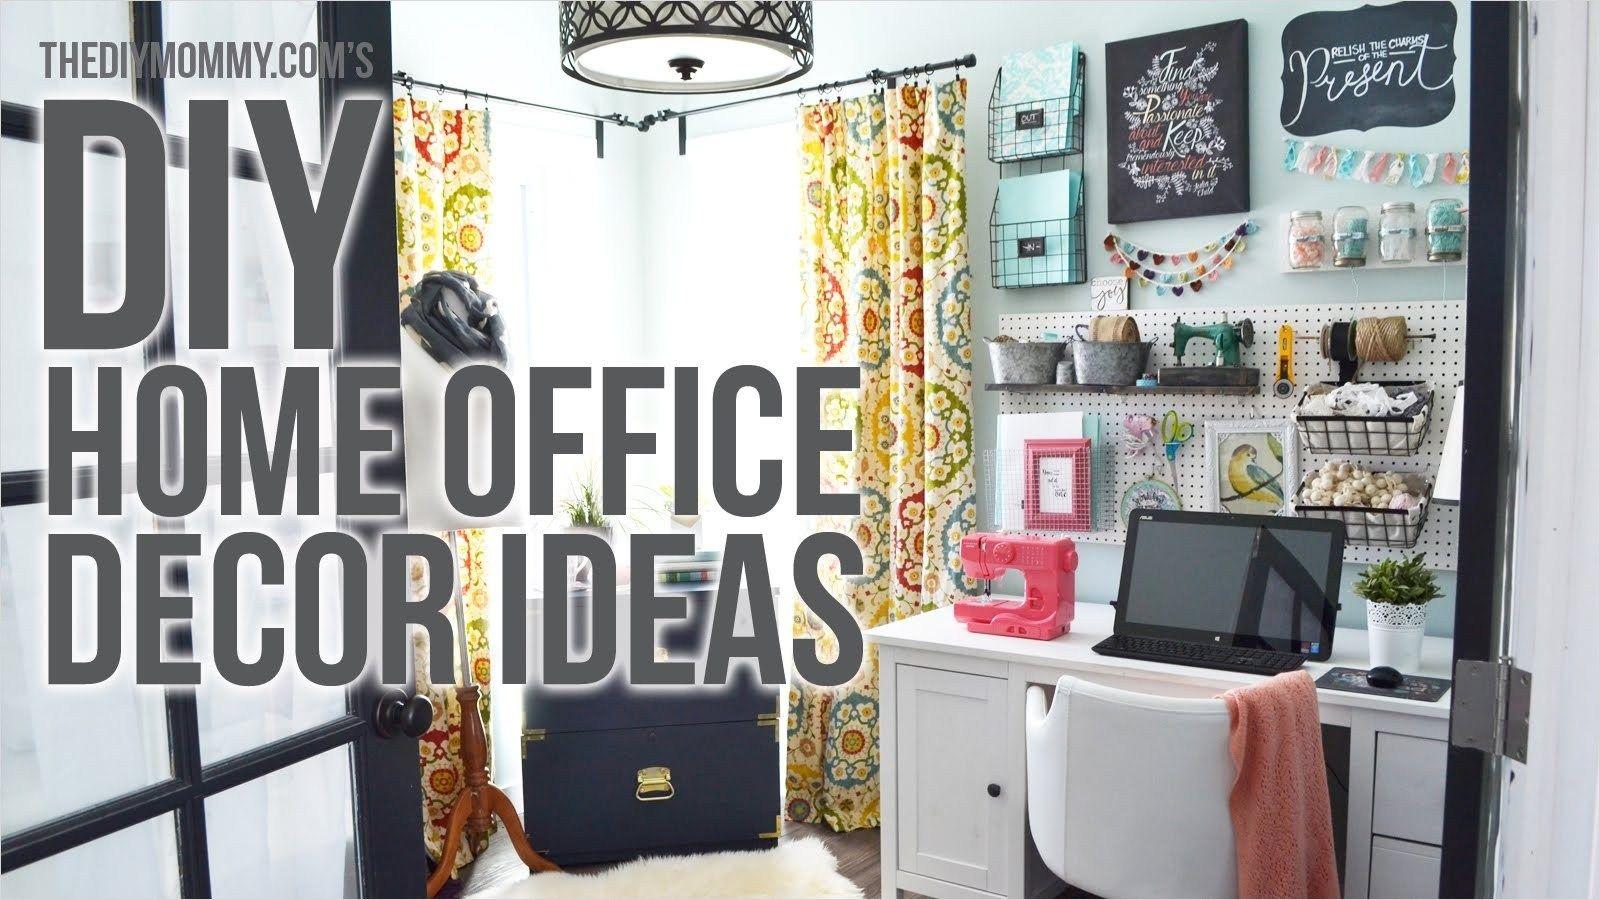 41 Beautiful Craft Room Wall Decorating Ideas Diy Office Diy Office Decor Craft Room Organization Diy